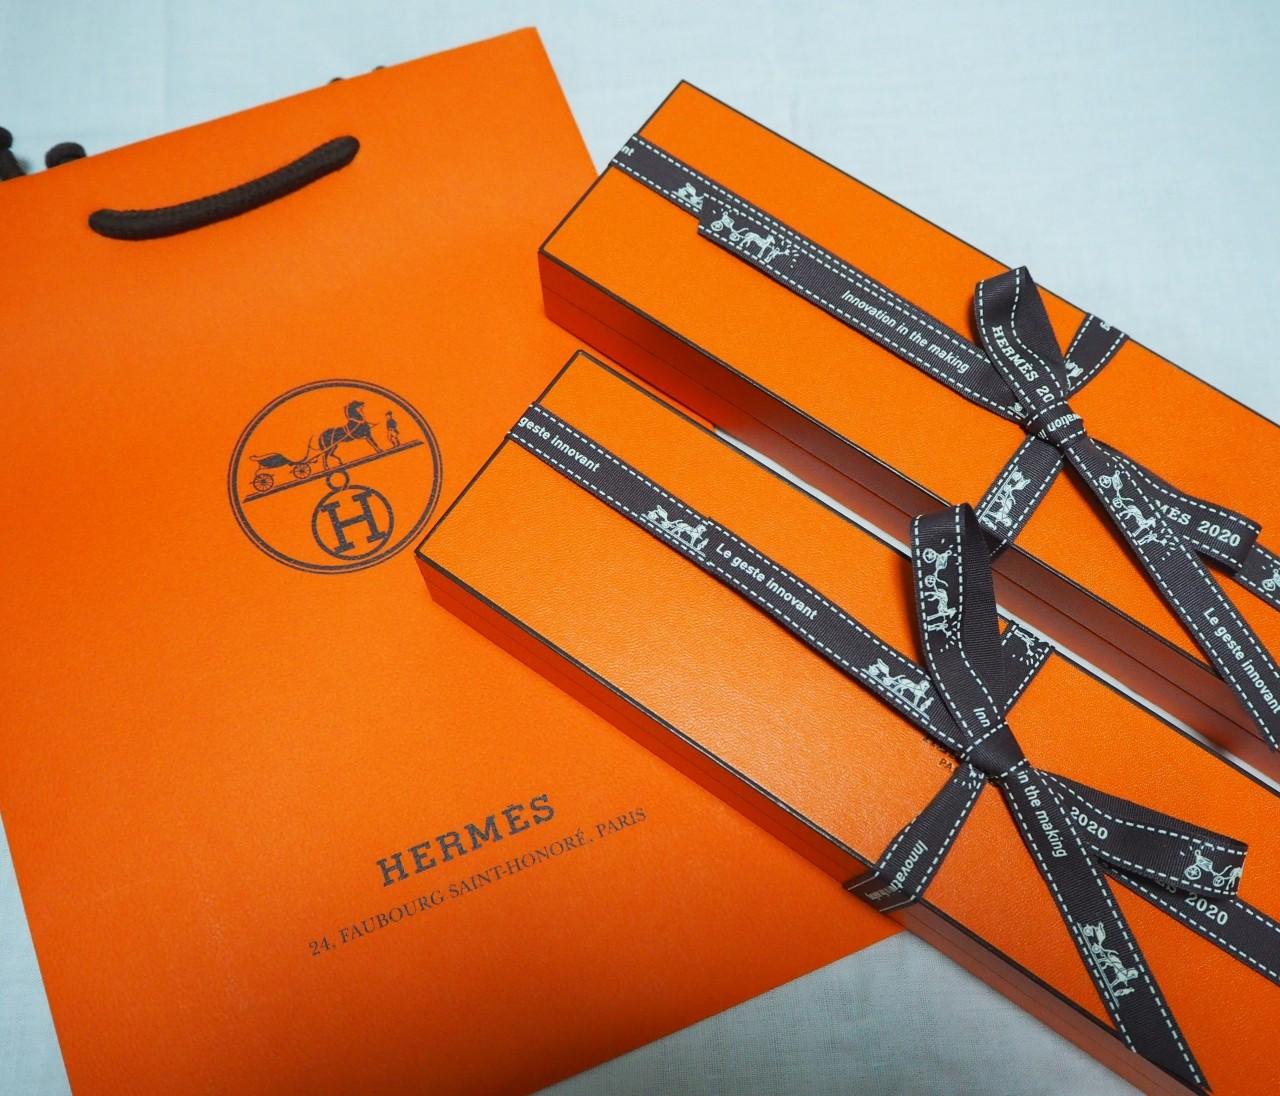 《HERMES》2020年のご褒美に、ココロトキメク名品を♡